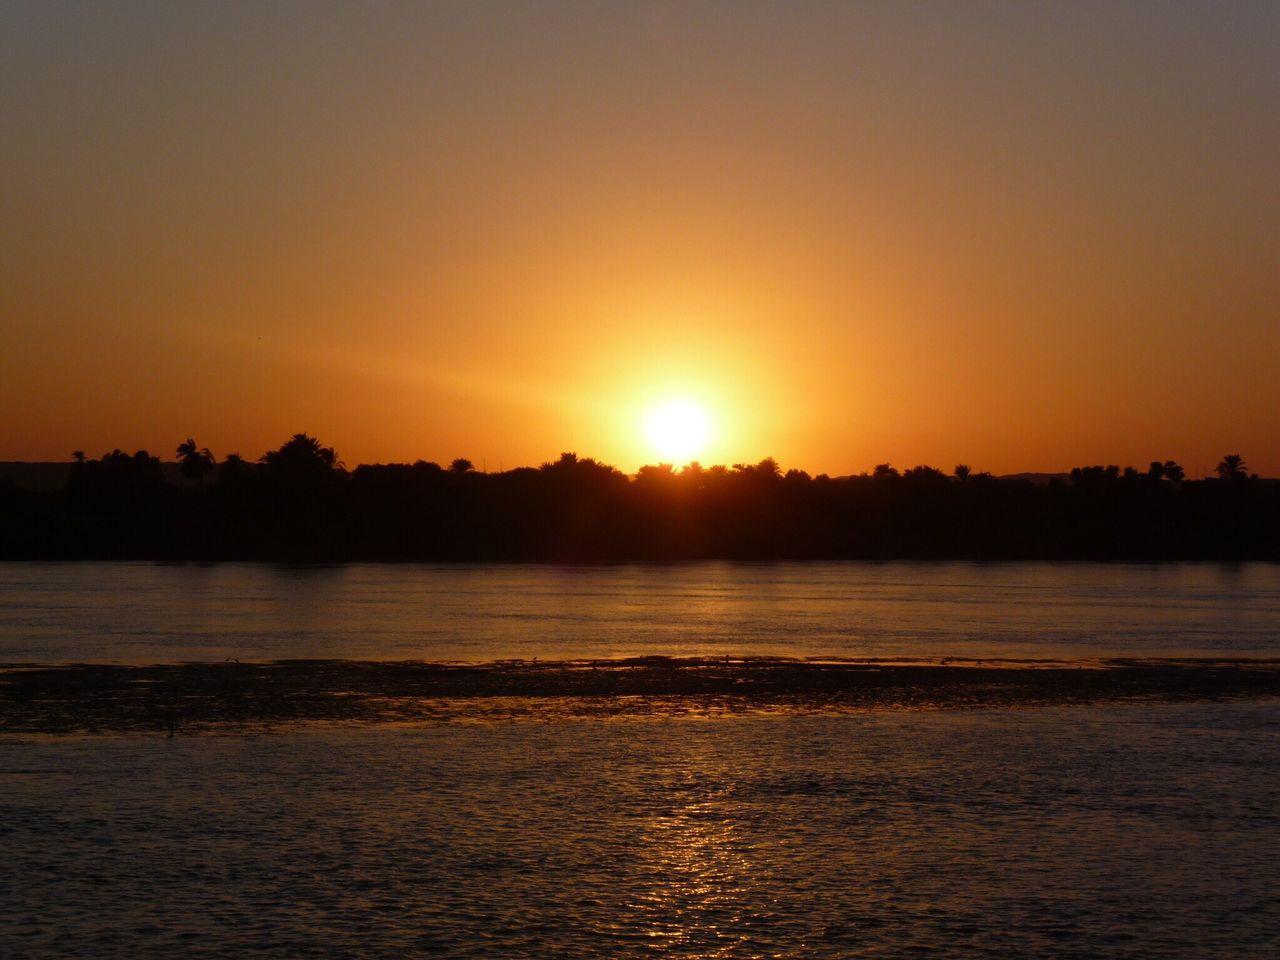 Egypte ´11 MajestueuxeOrange Scène TranquillenTranquillityuSoleil IdylliquelNature PaysagepScène Non Urbain Orange ColoreExterieurterieur